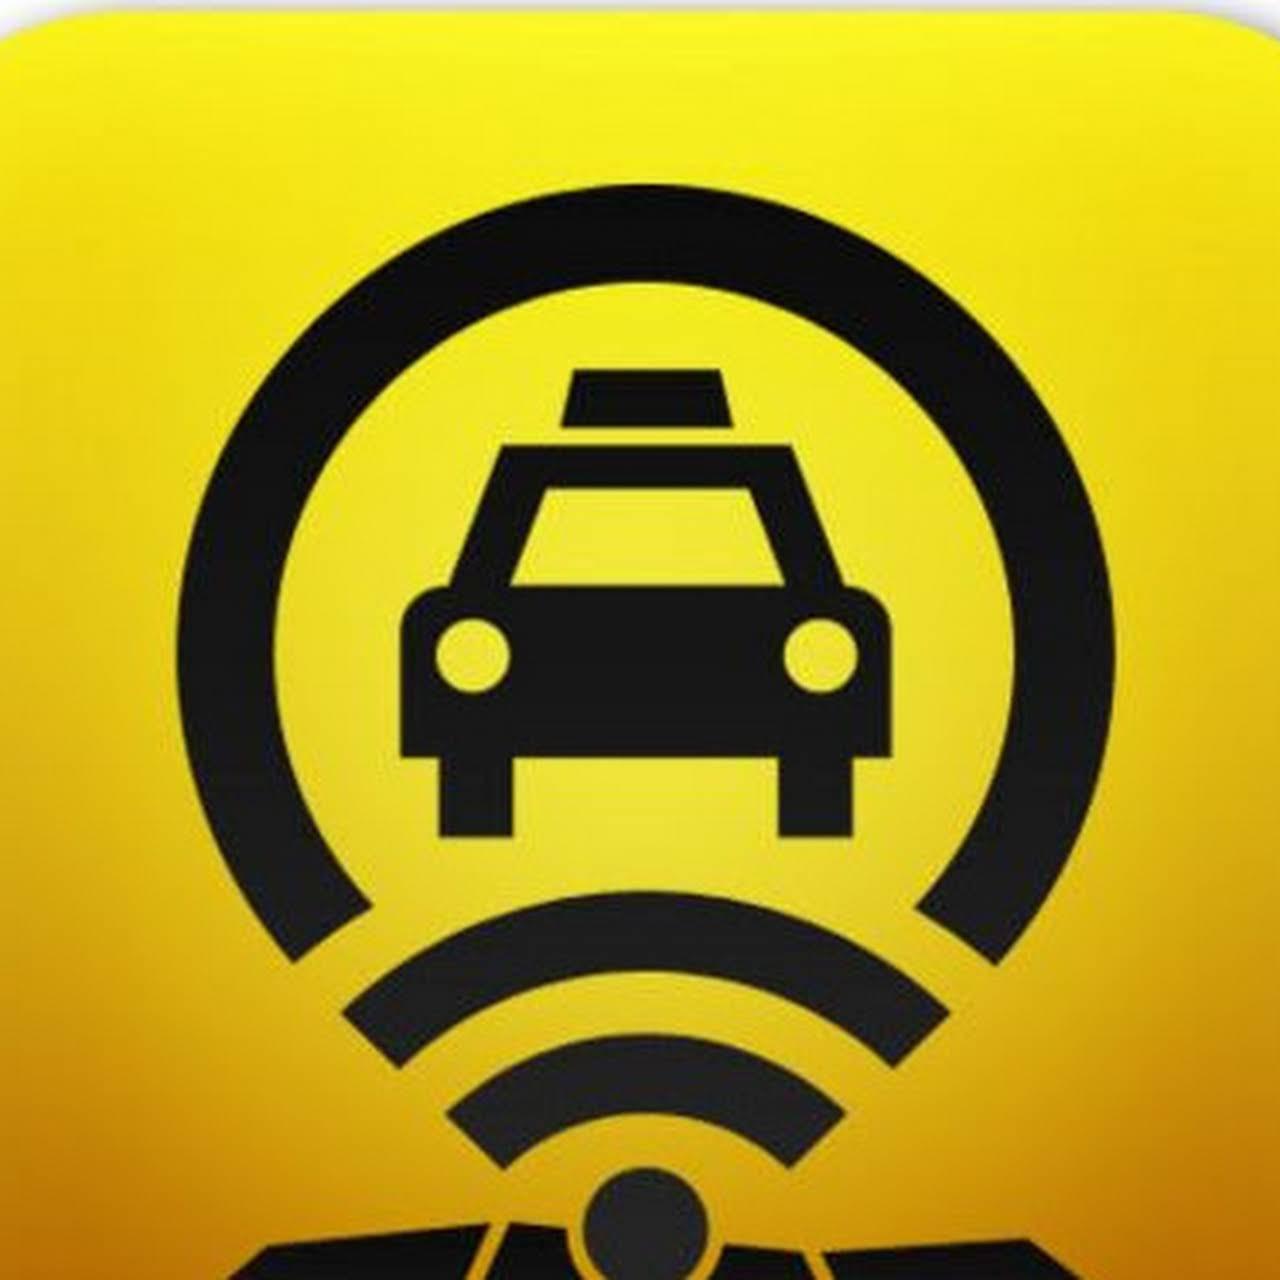 Future Cab LLC - Cab, Taxi Service in Burlington Vermont